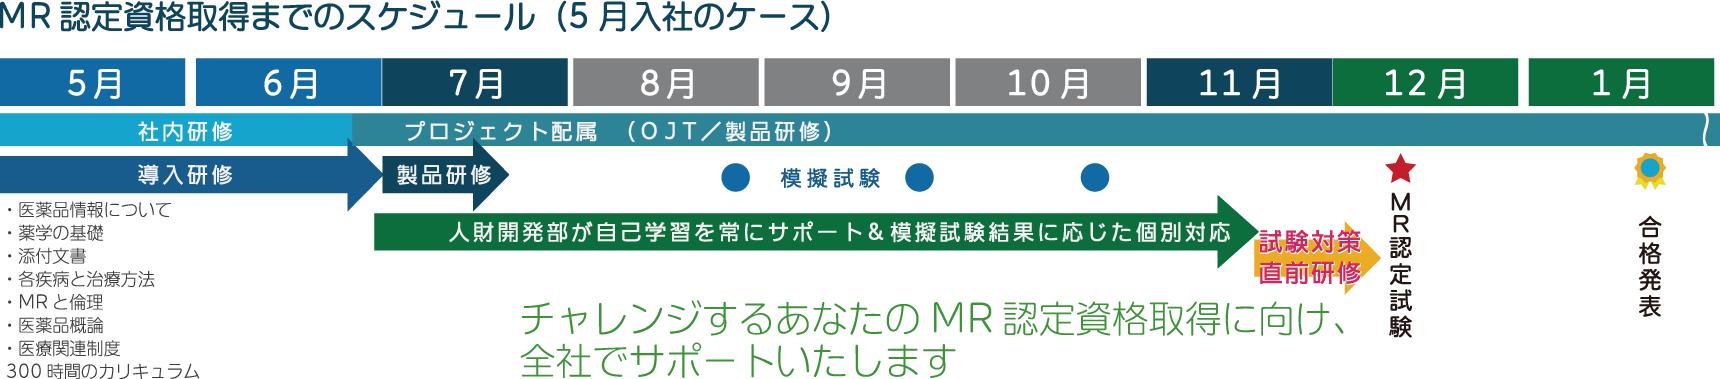 MR認定資格取得までの教育研修スケジュール